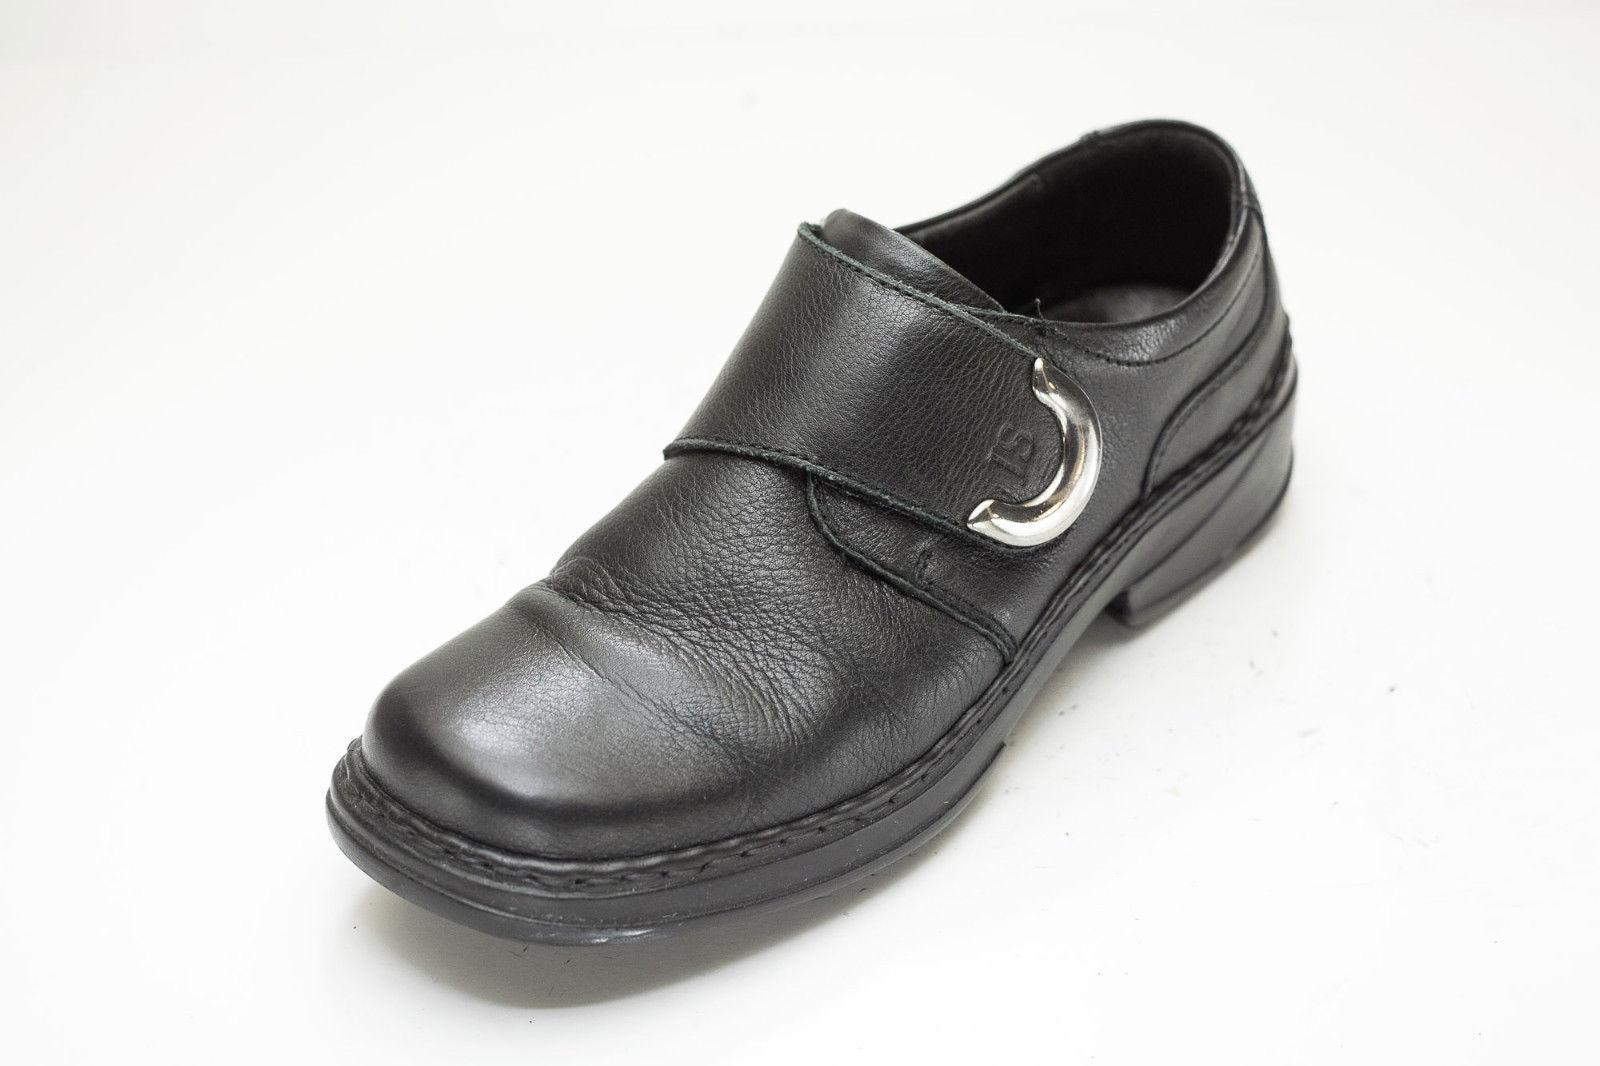 Josef Seibel Theresa 7 Black Slip On Shoe Women's EU 38